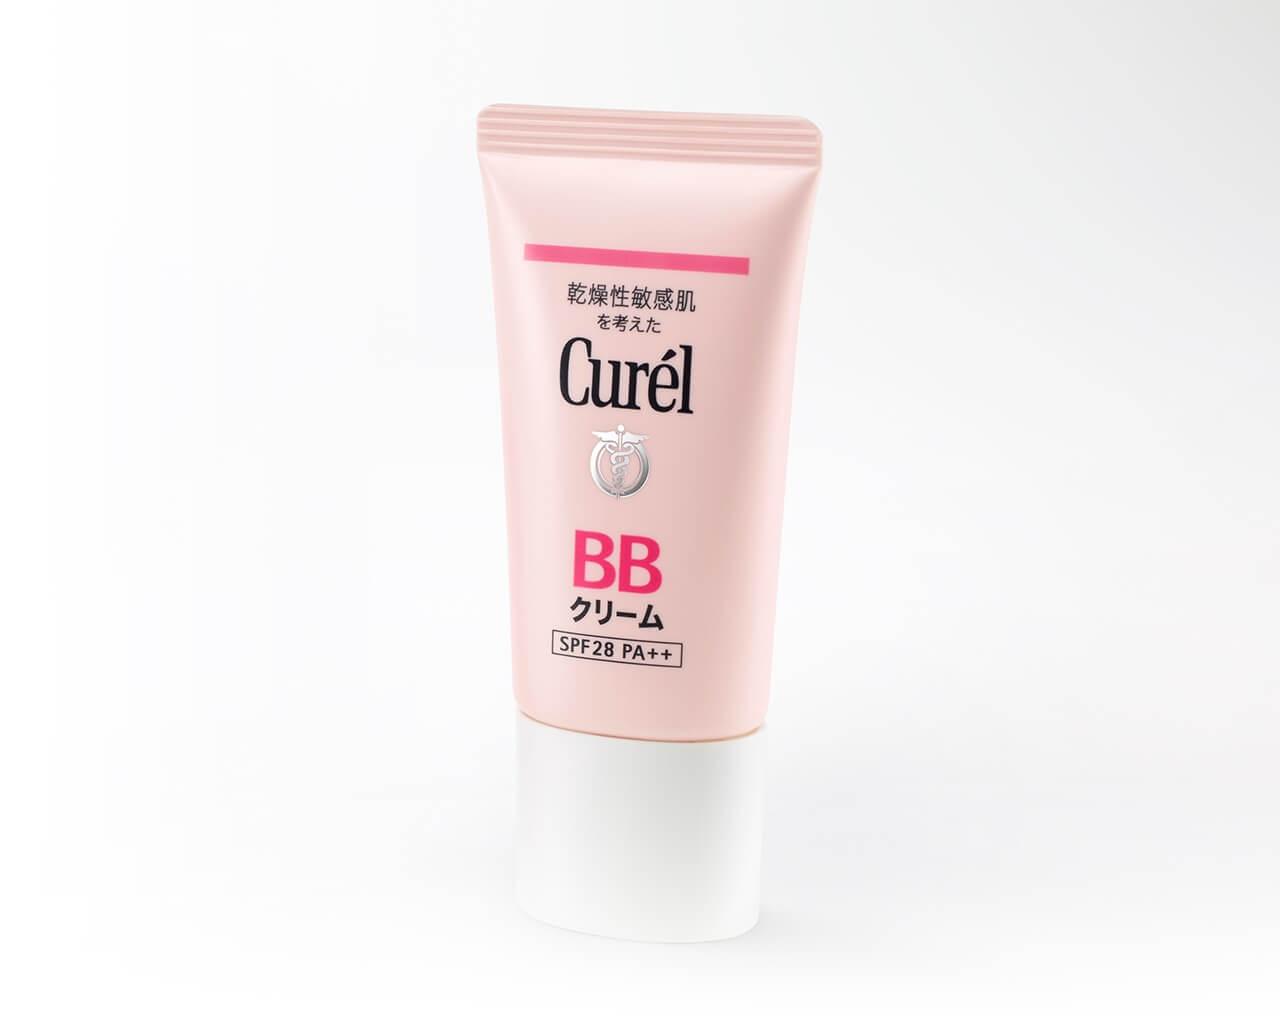 Curel BB SPF28 PA++.